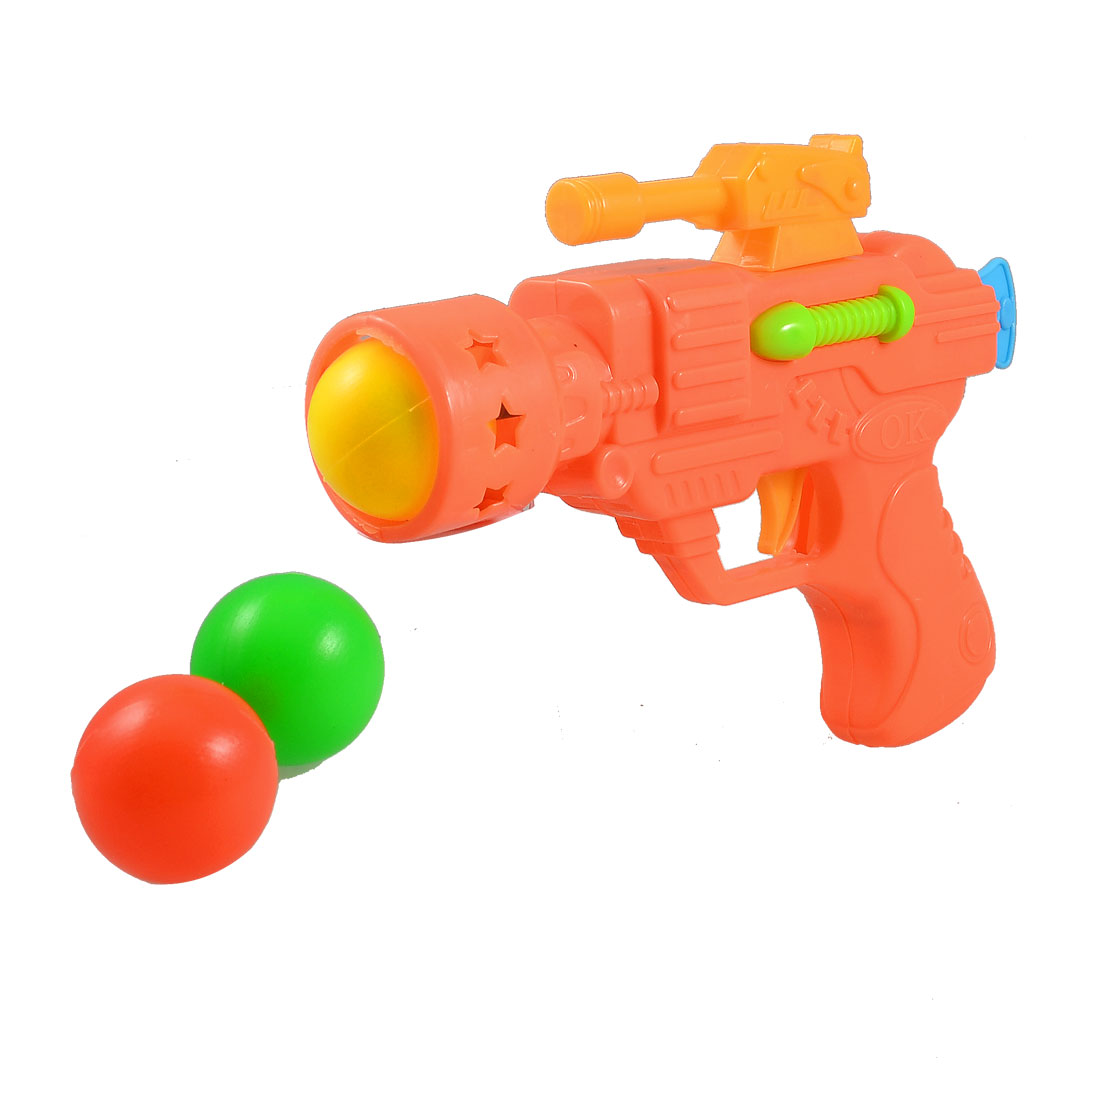 Children Kid Gift Plastic 3 Table Tennis Ball Shooting Gun Model Toy Orange Red